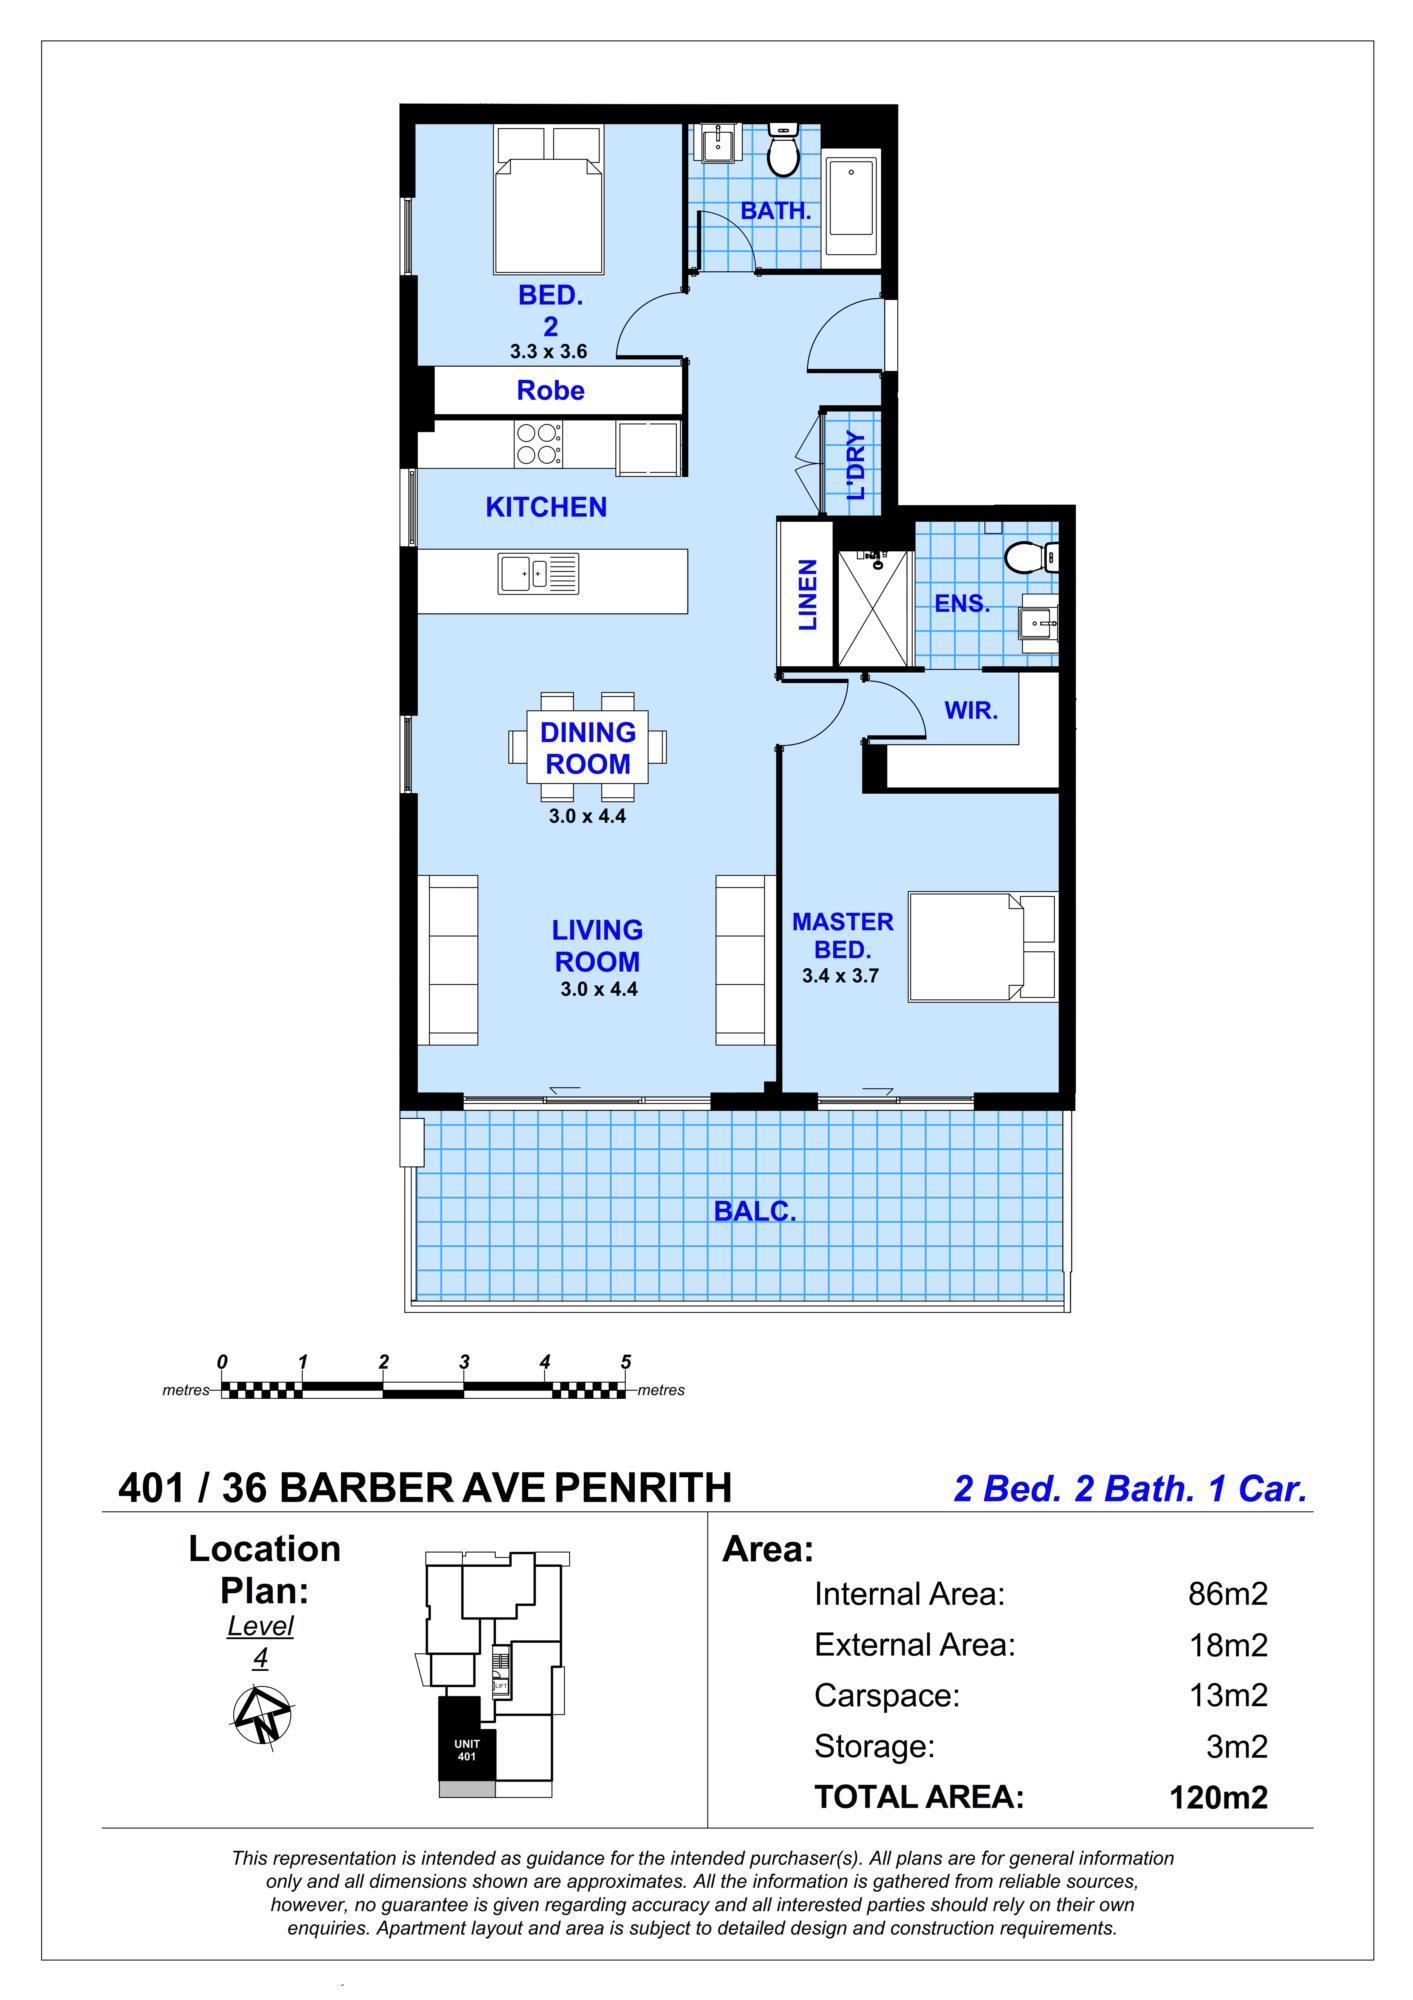 401/36 Barber Avenue PENRITH, NSW 2750